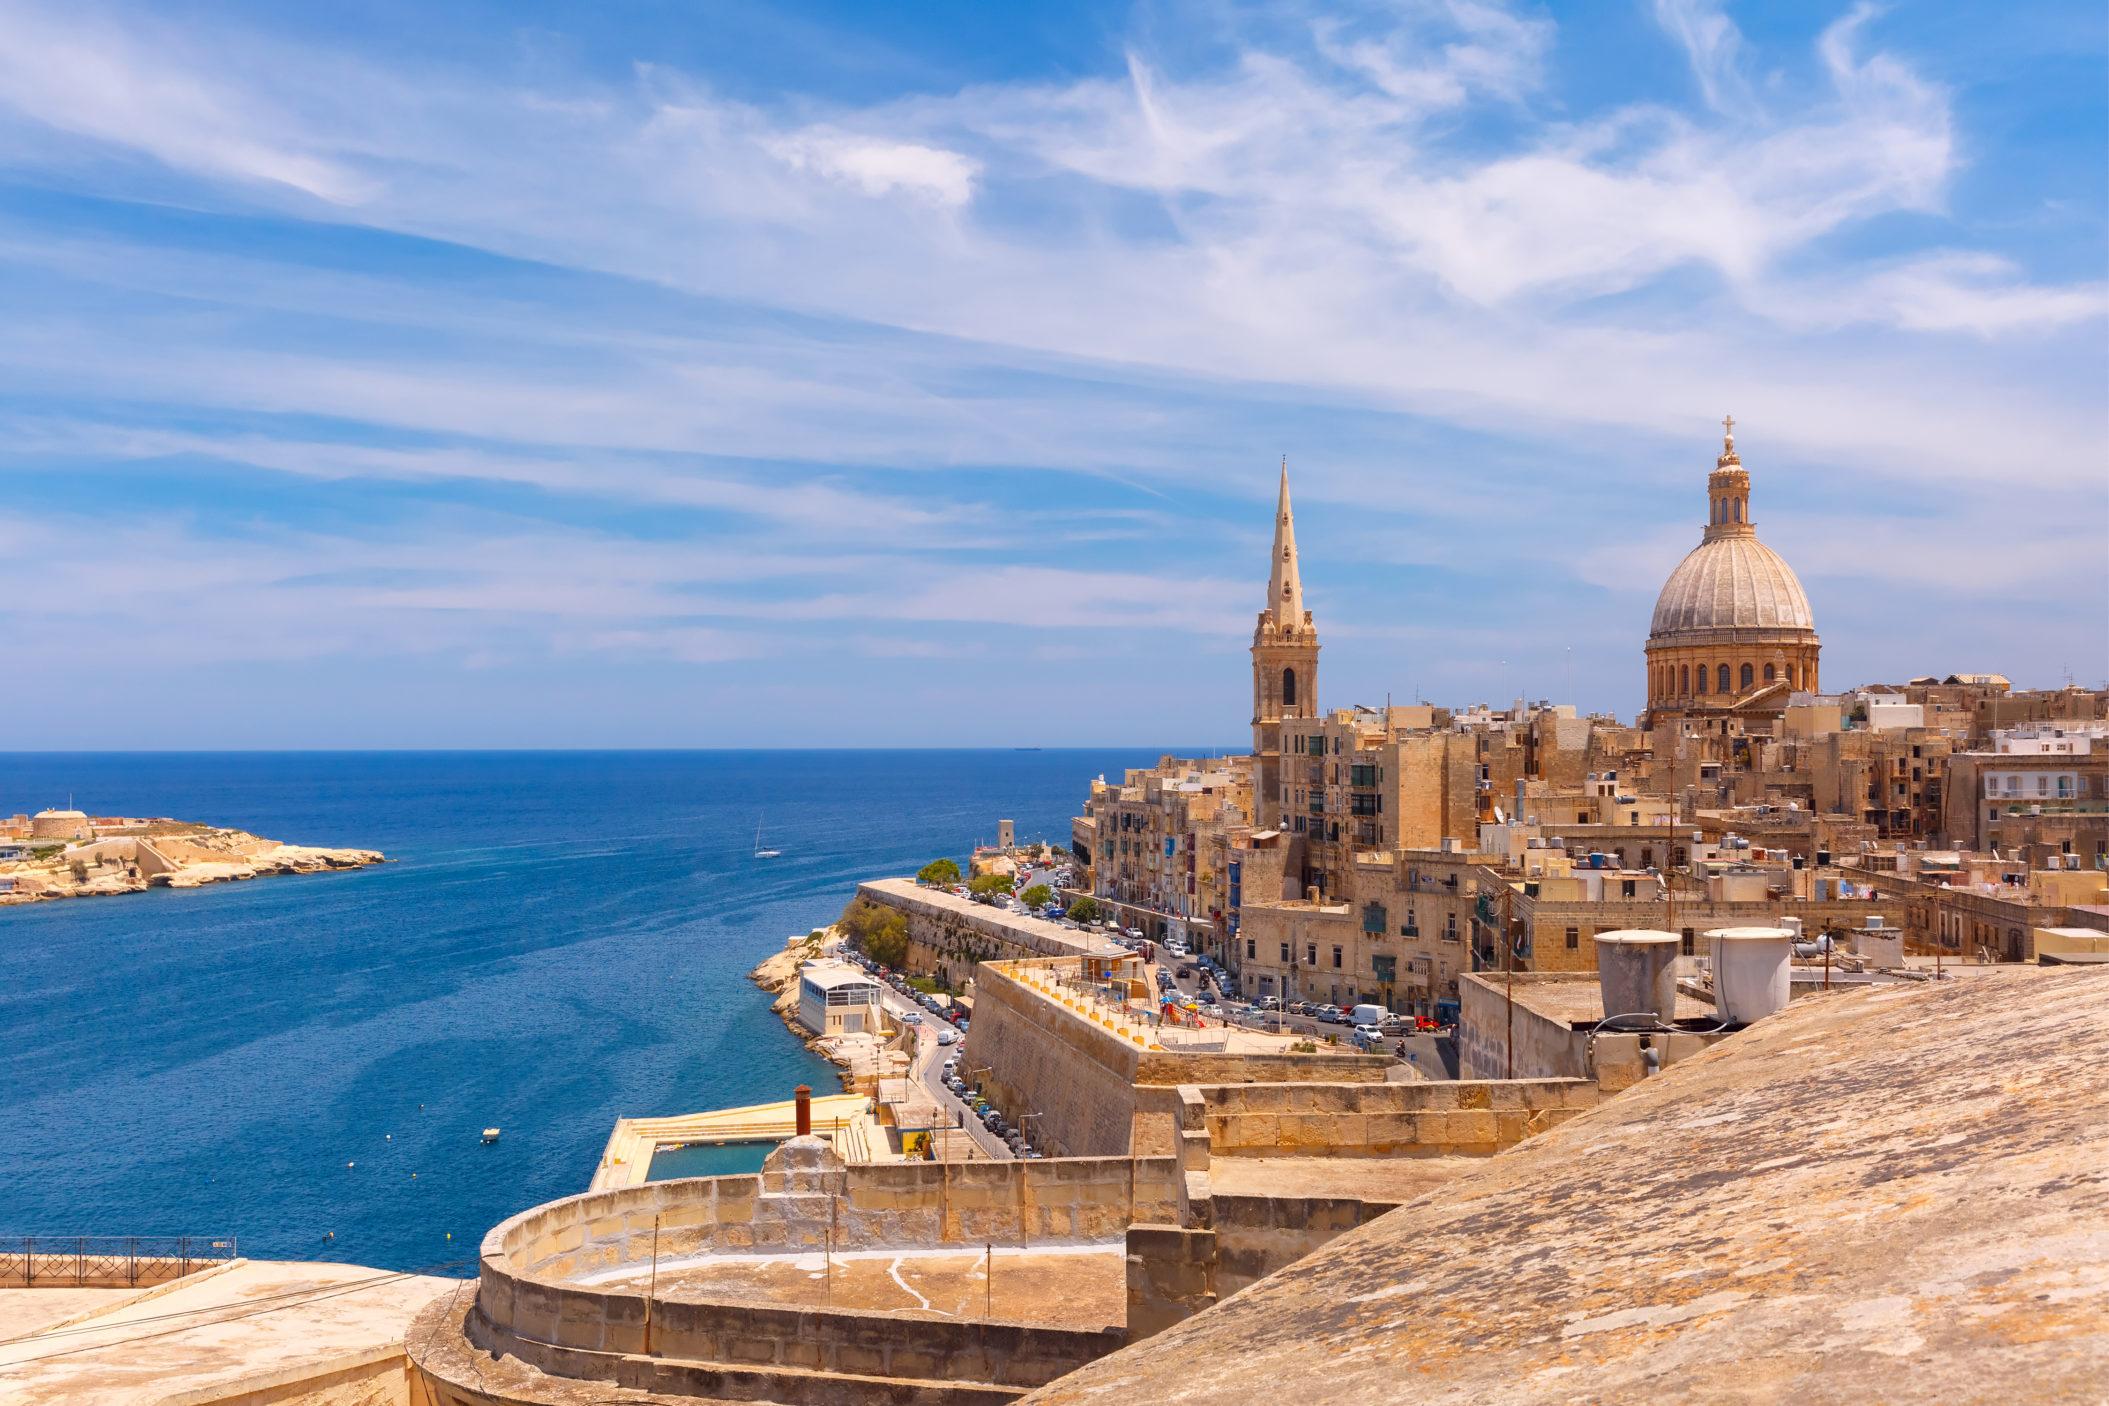 Malta [Shutterstock]